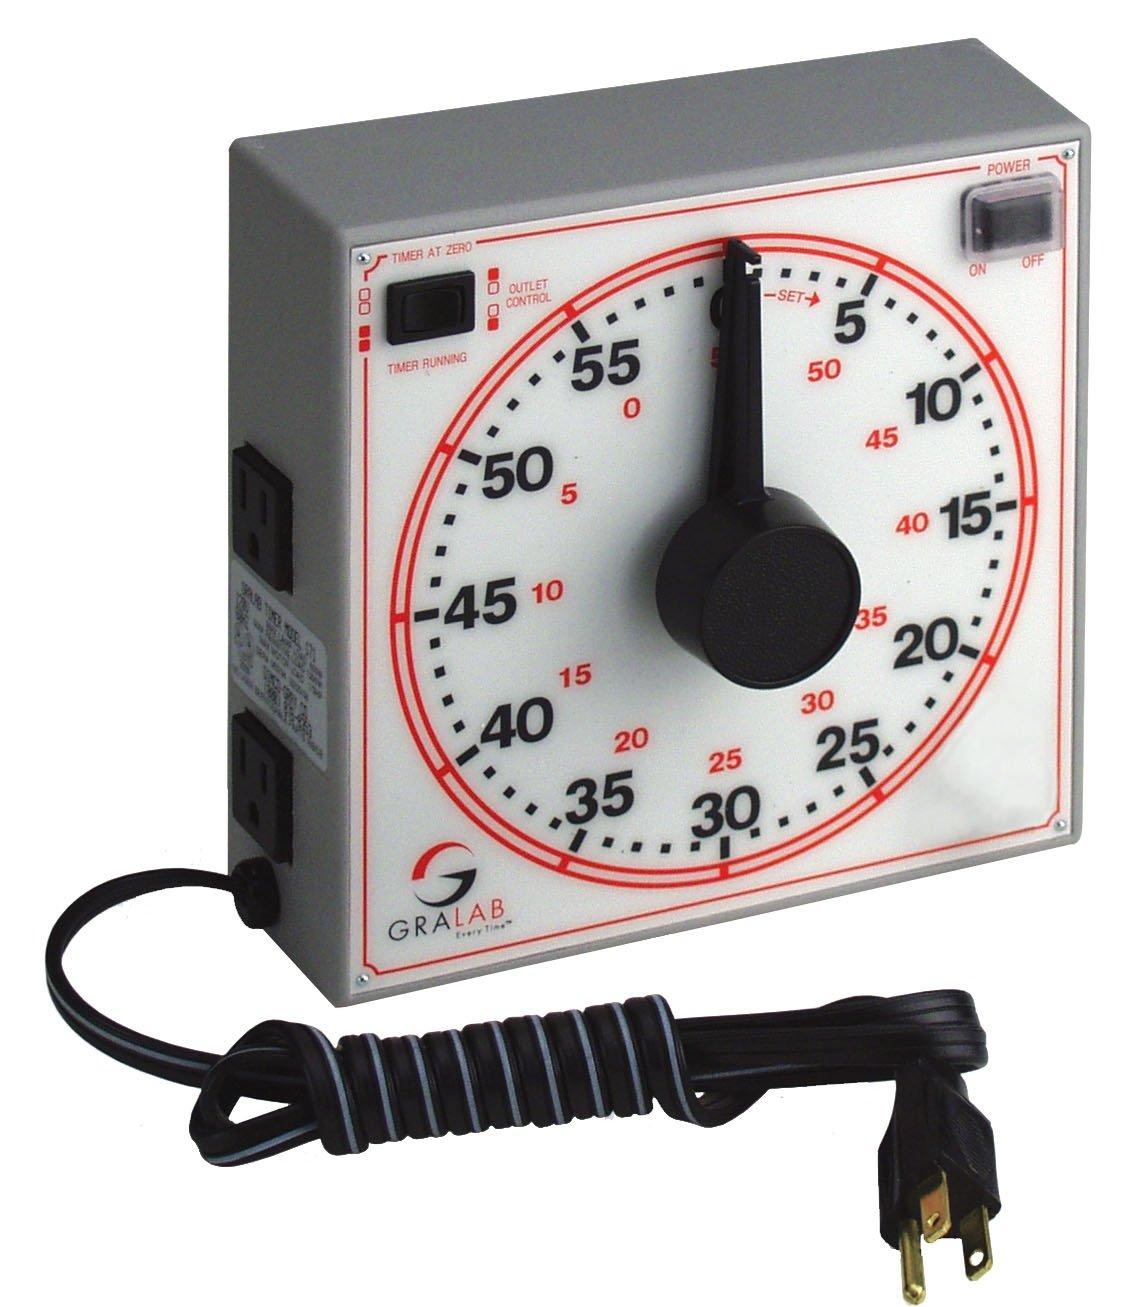 gralab model 171 60 minute general purpose timer 7 1 2 length x 7